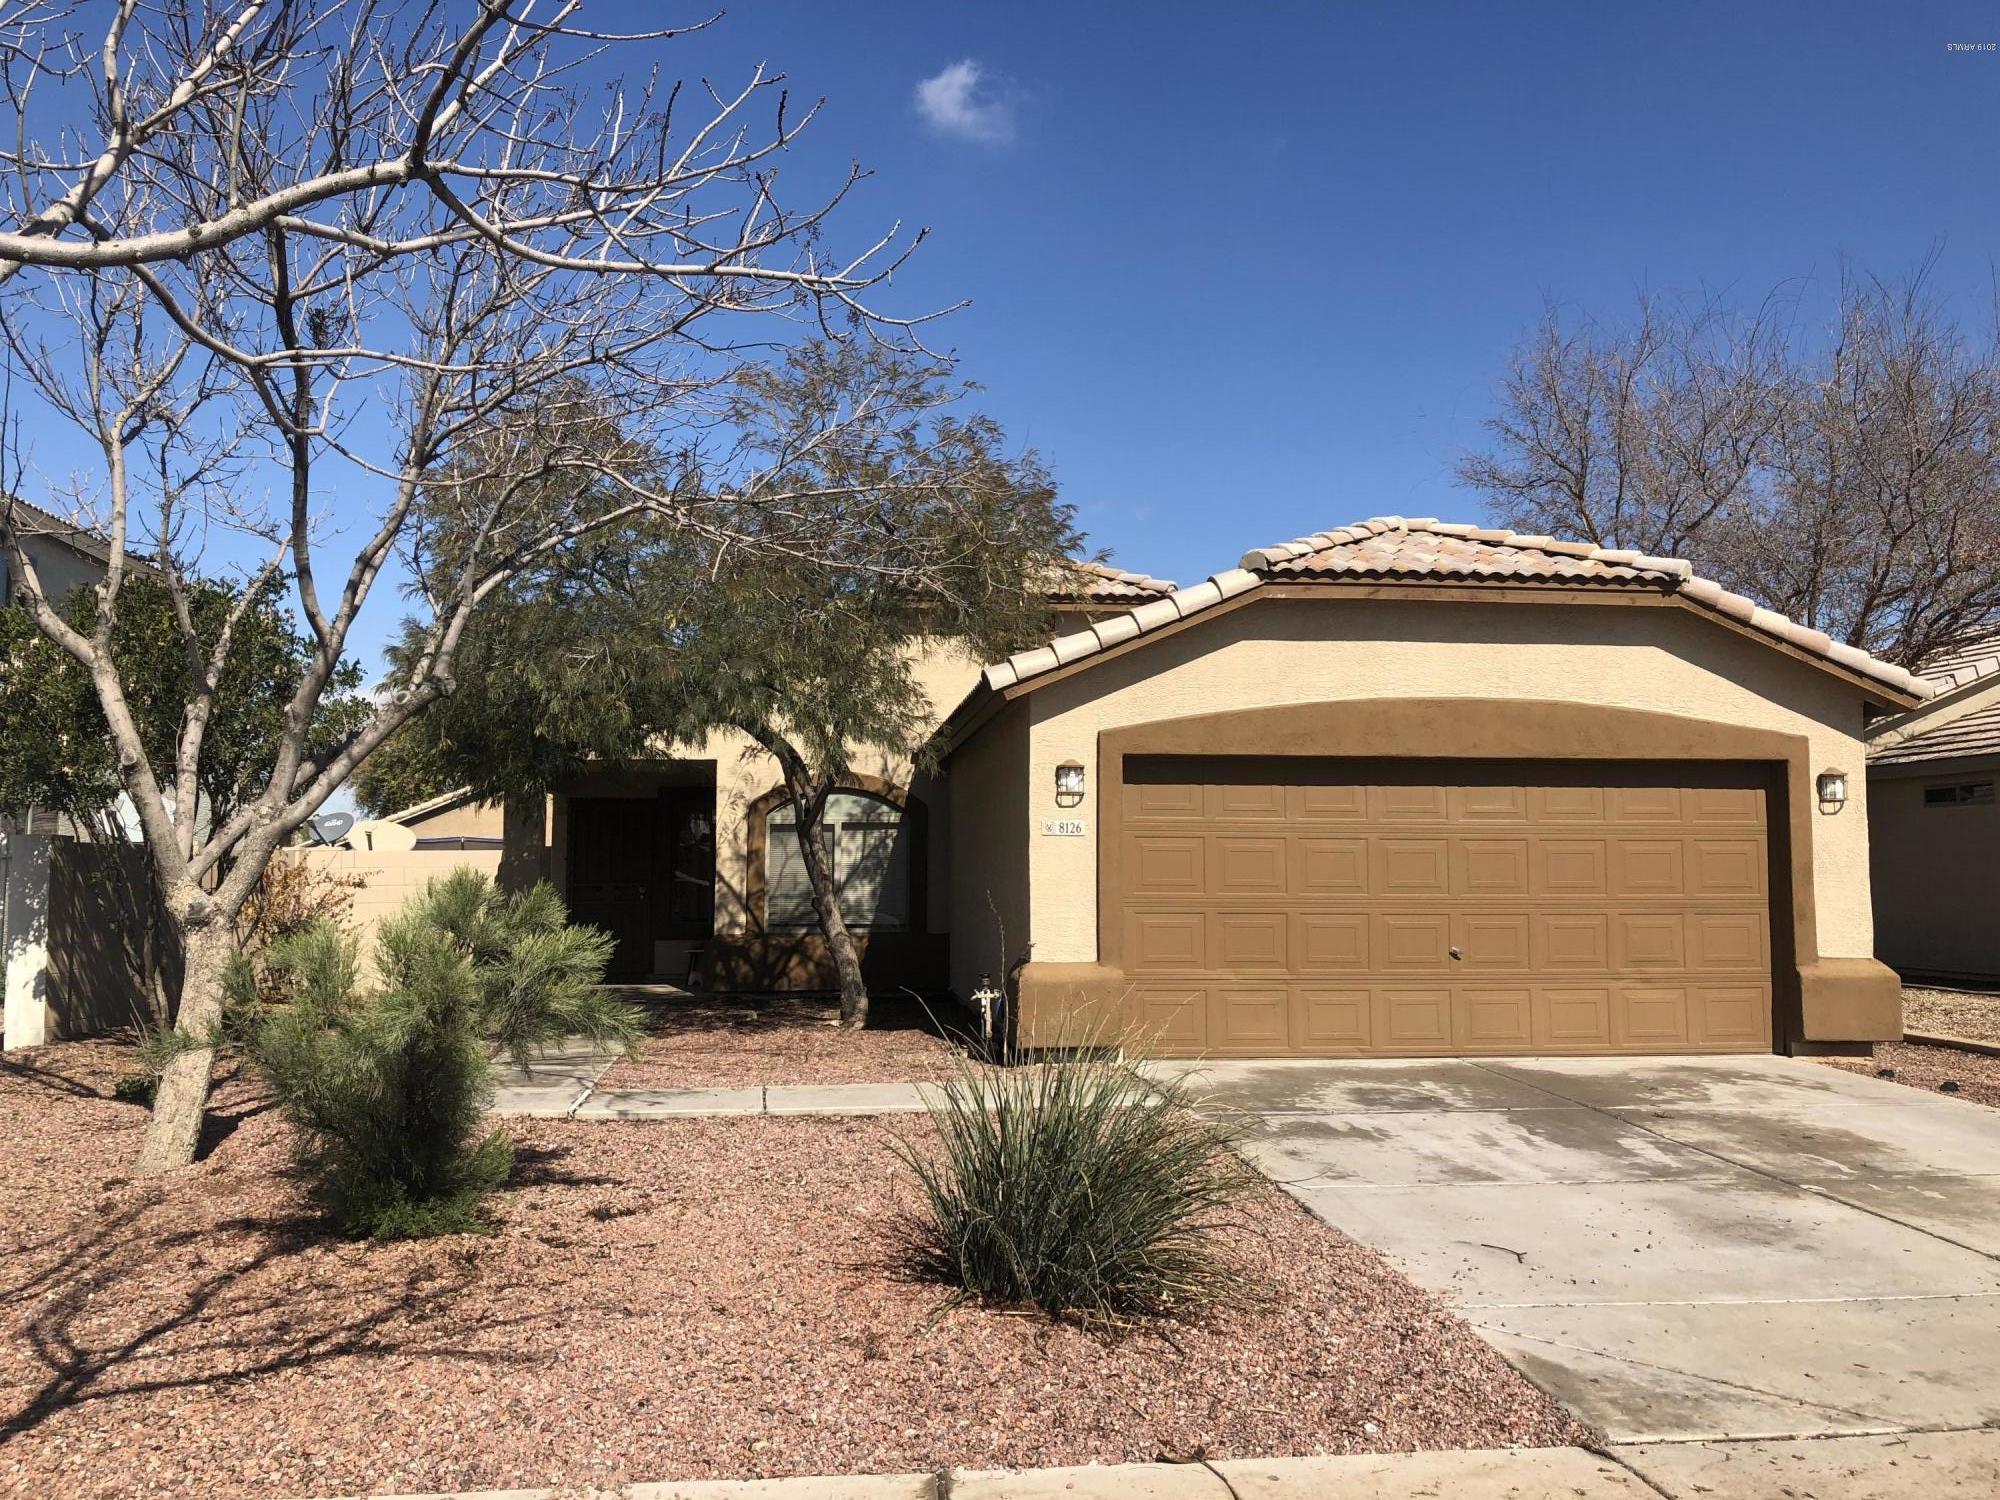 Photo of 8126 W MAGNOLIA Street, Phoenix, AZ 85043